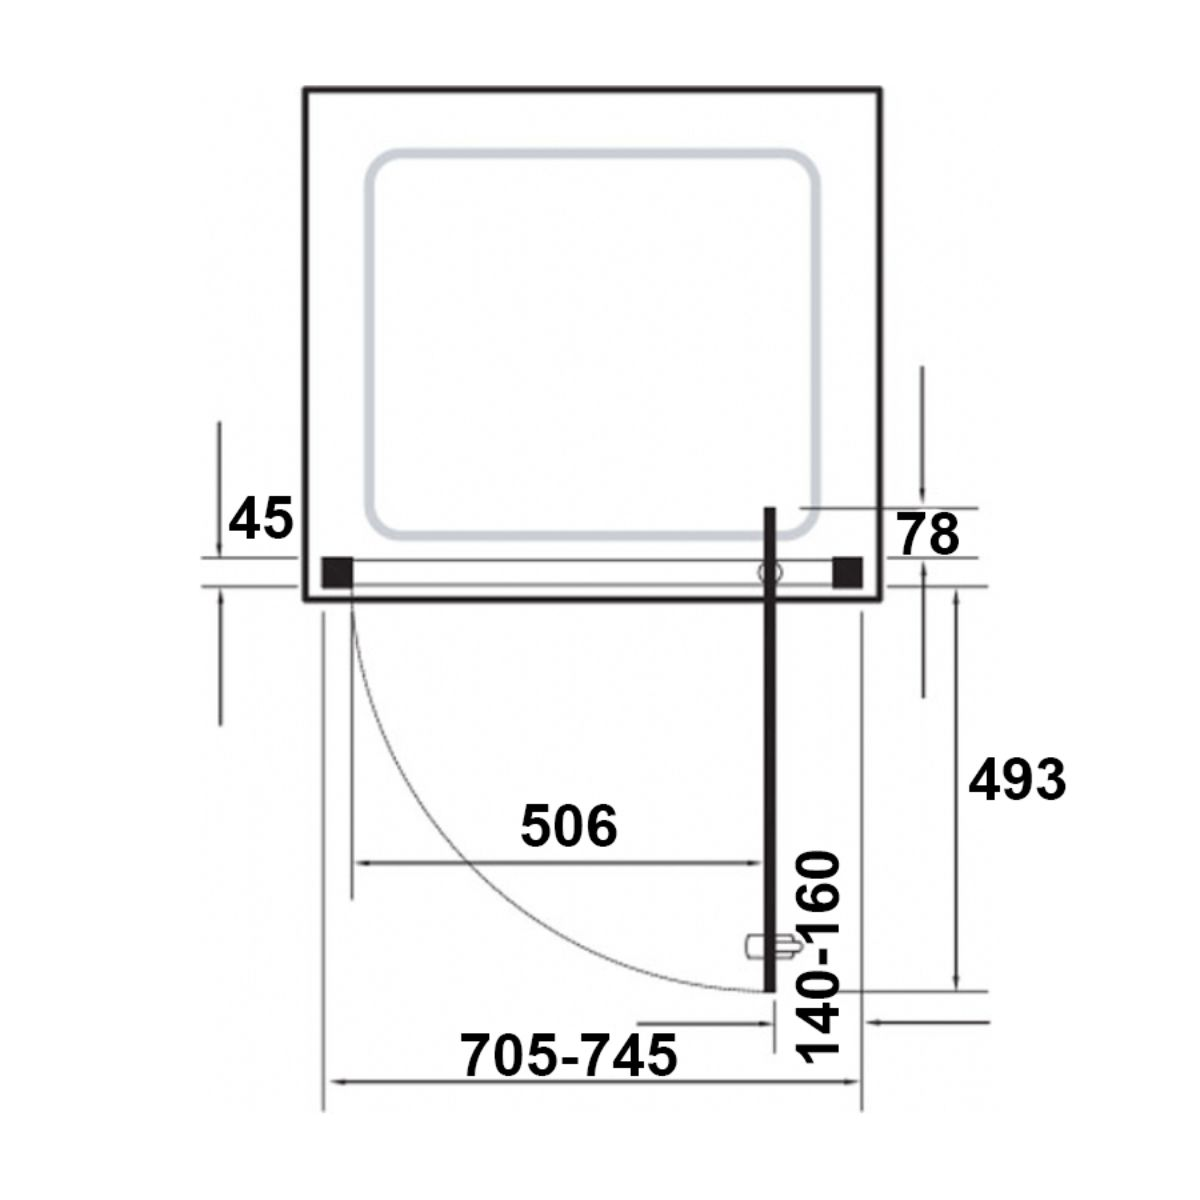 kudosoriginalstraightpivotshowerenclosure760dimensions